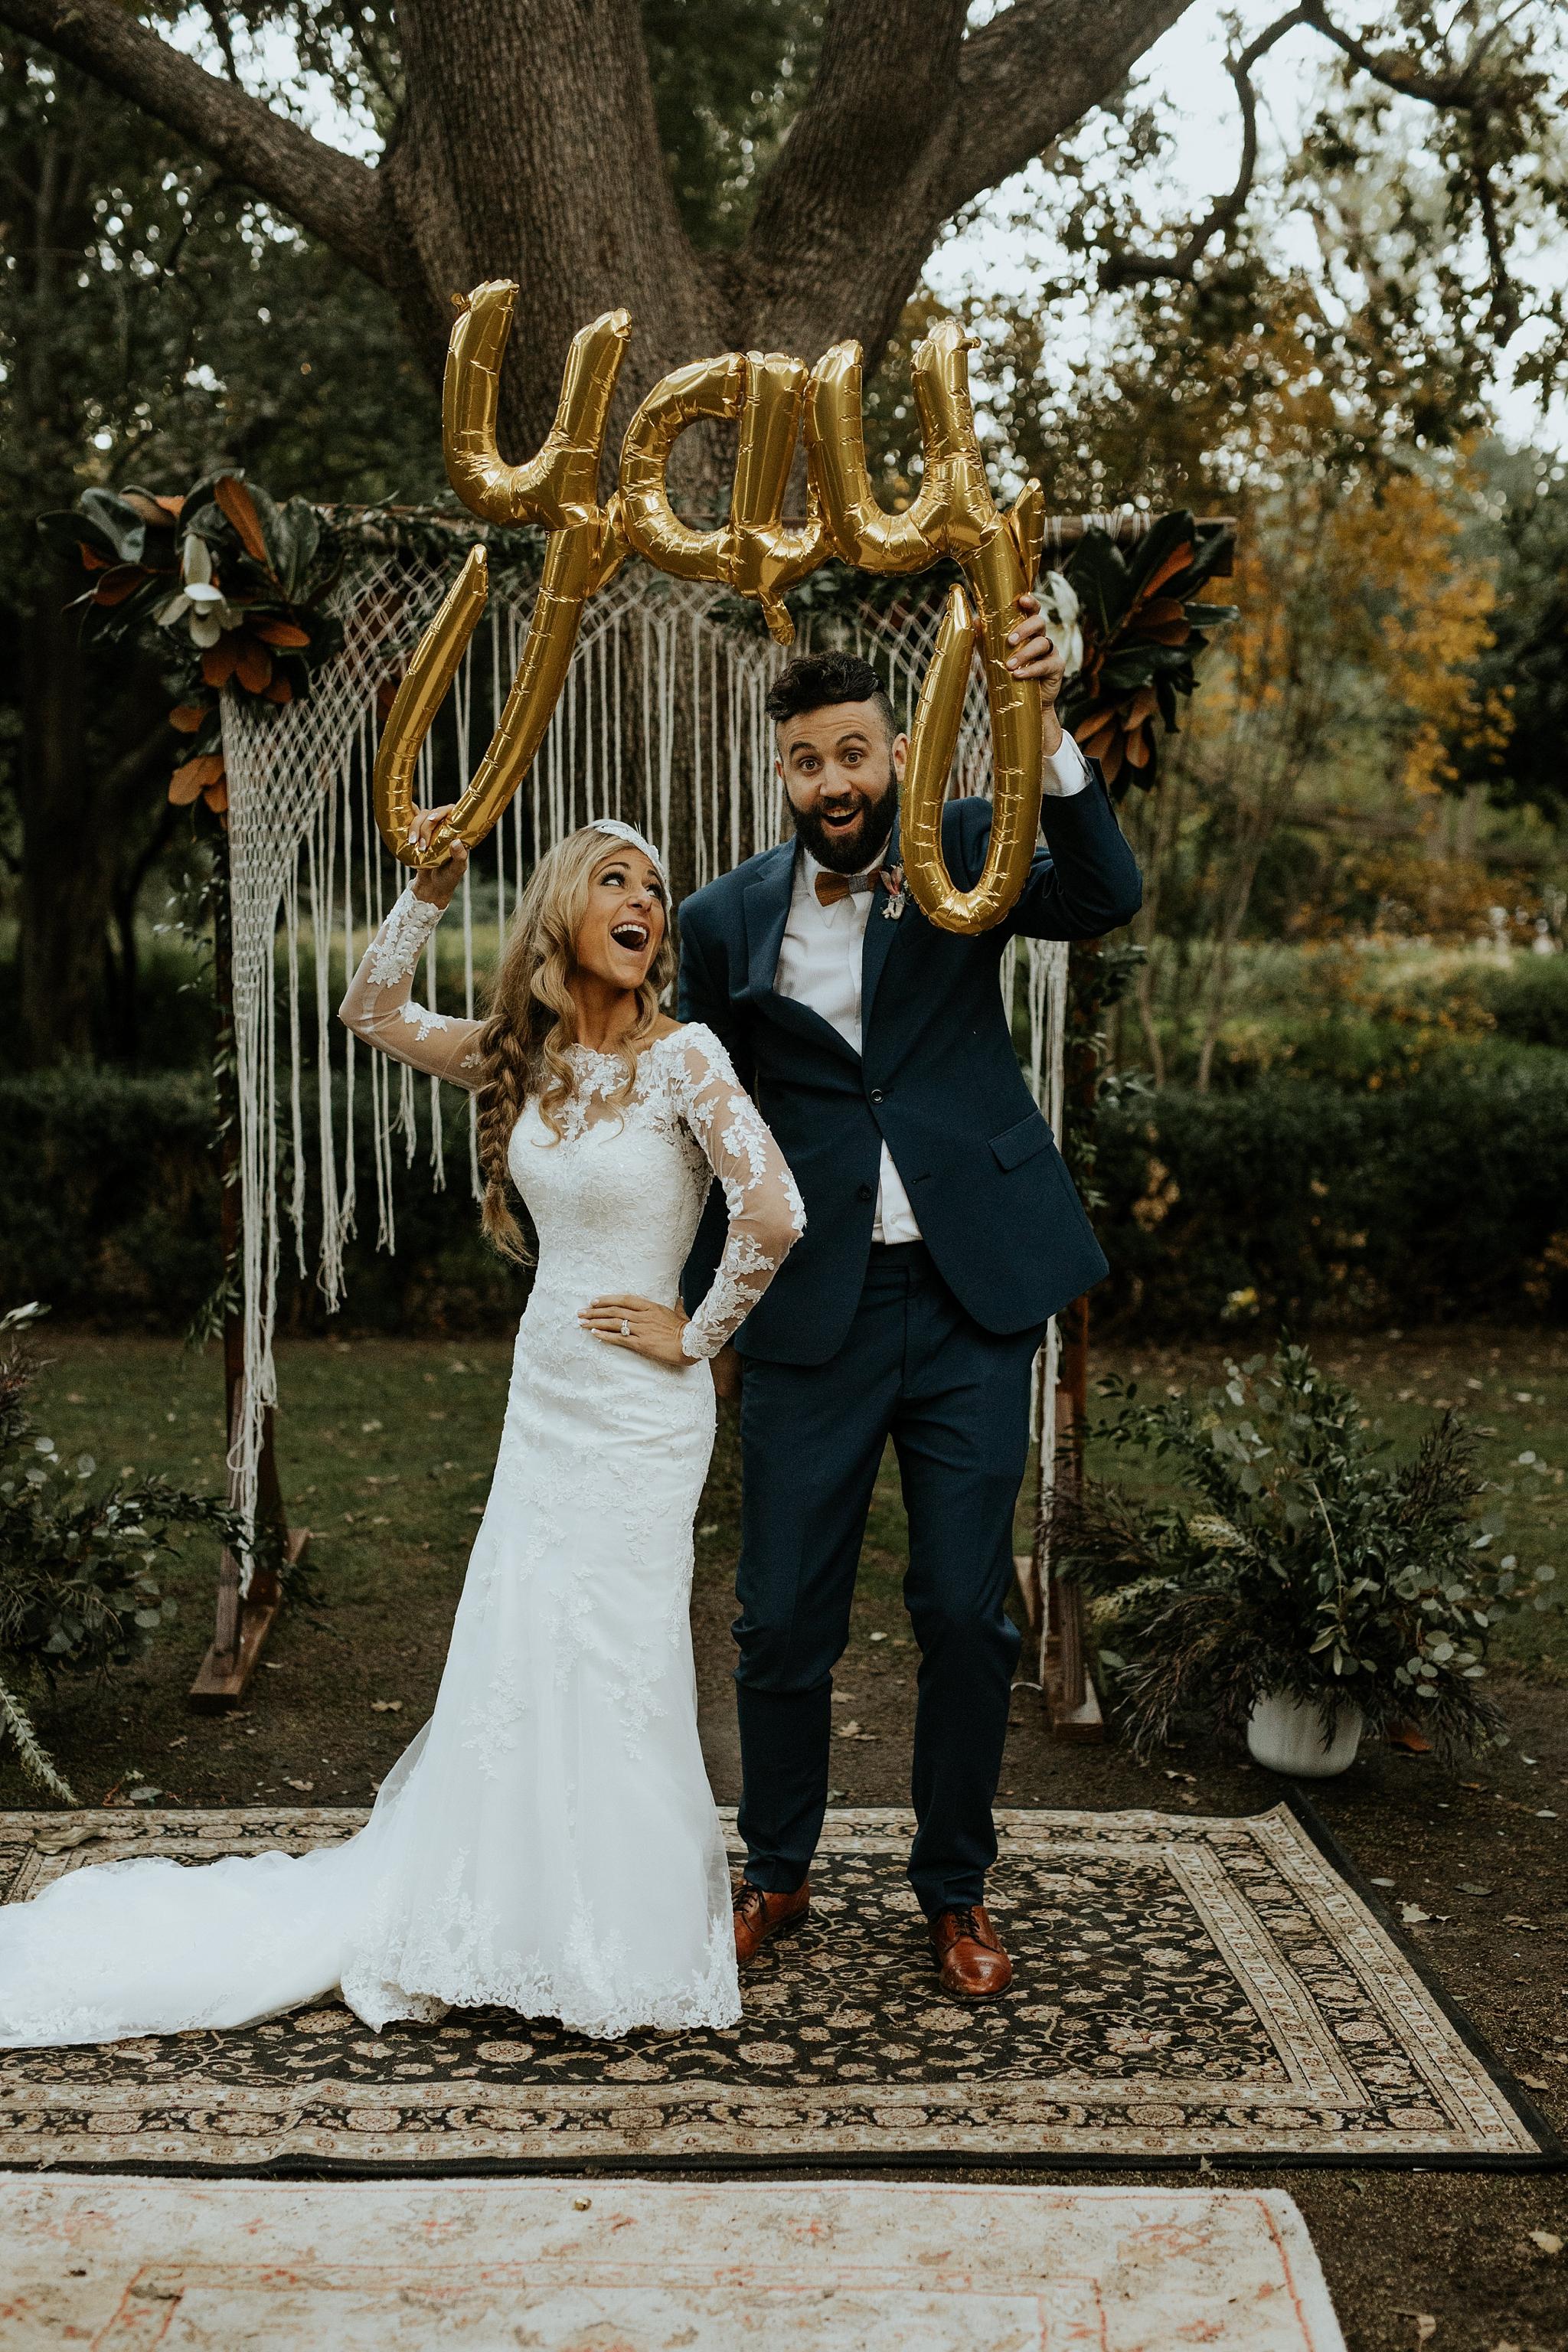 Bohemian Orcutt Ranch Wedding in Los Angeles California  - Los Angeles Californai Wedding Photographer_0044.jpg